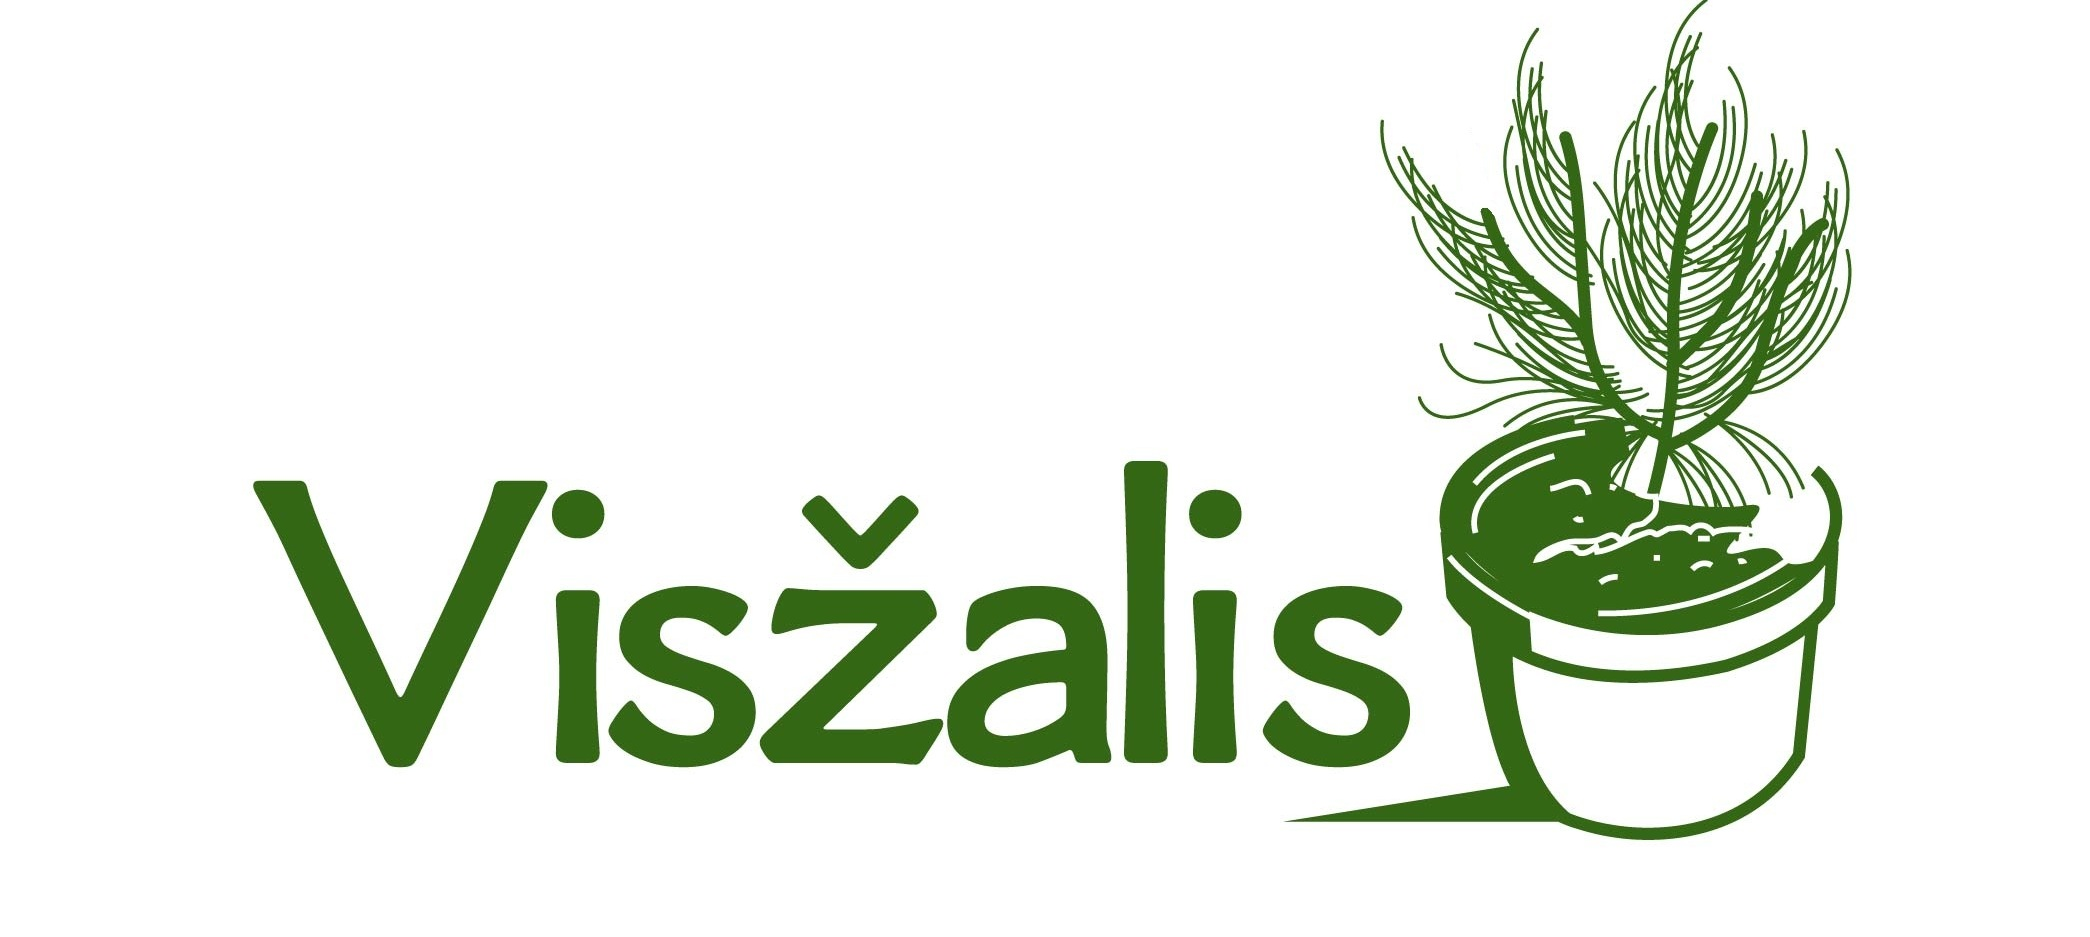 Viszalis